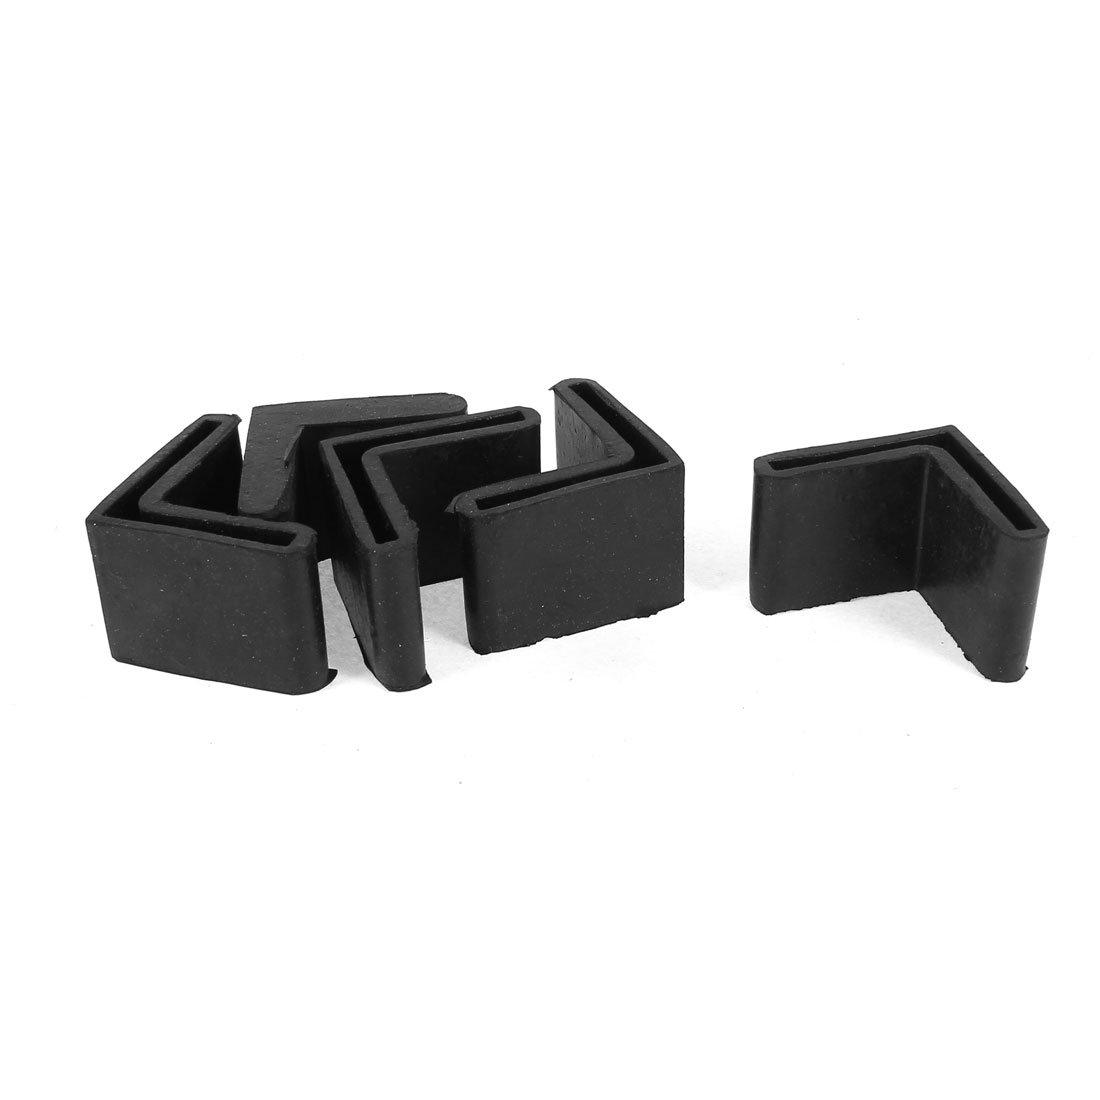 sourcingmap 4 st ck schwarzen gummil geformte m bel. Black Bedroom Furniture Sets. Home Design Ideas